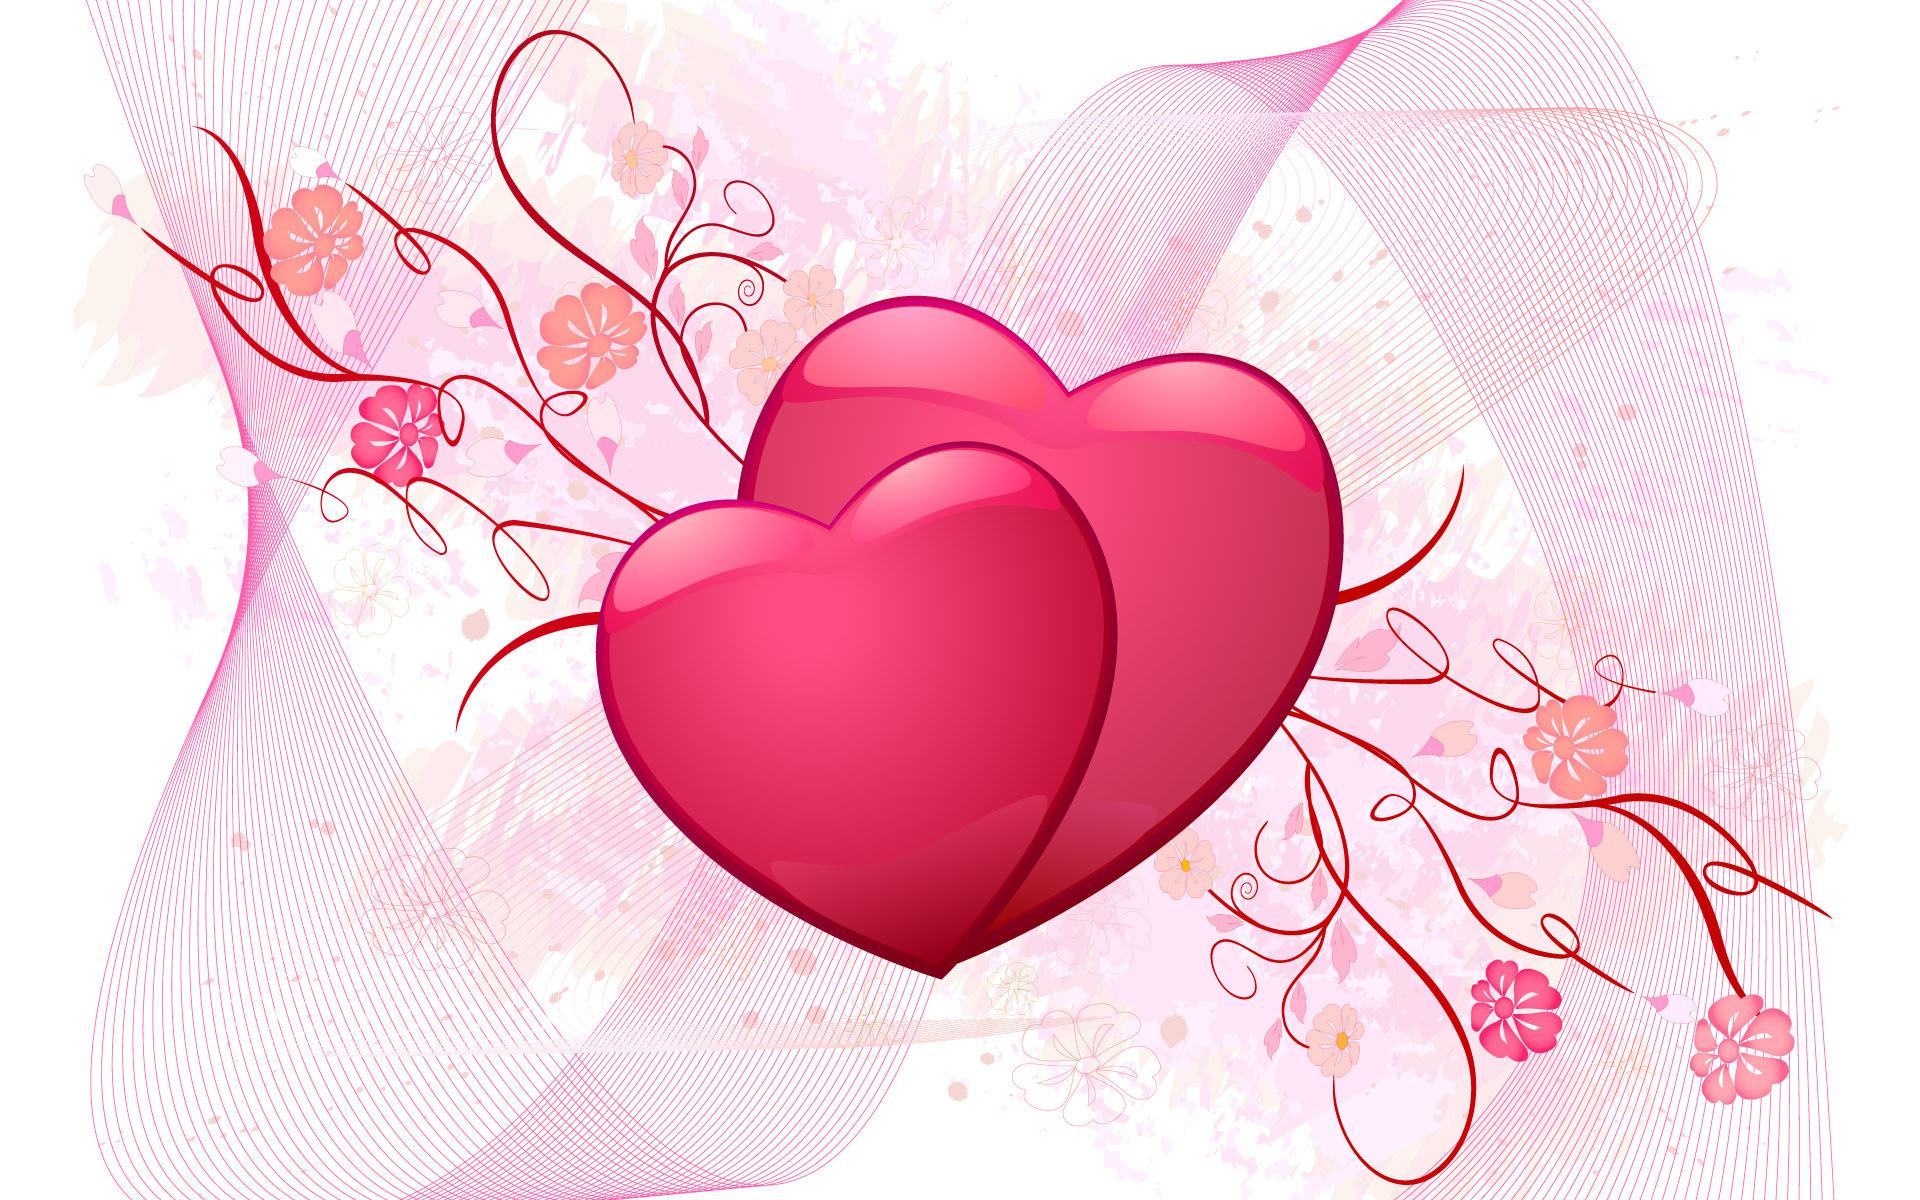 1920x1200 Description Download Couple Of Hearts Love Wallpaper